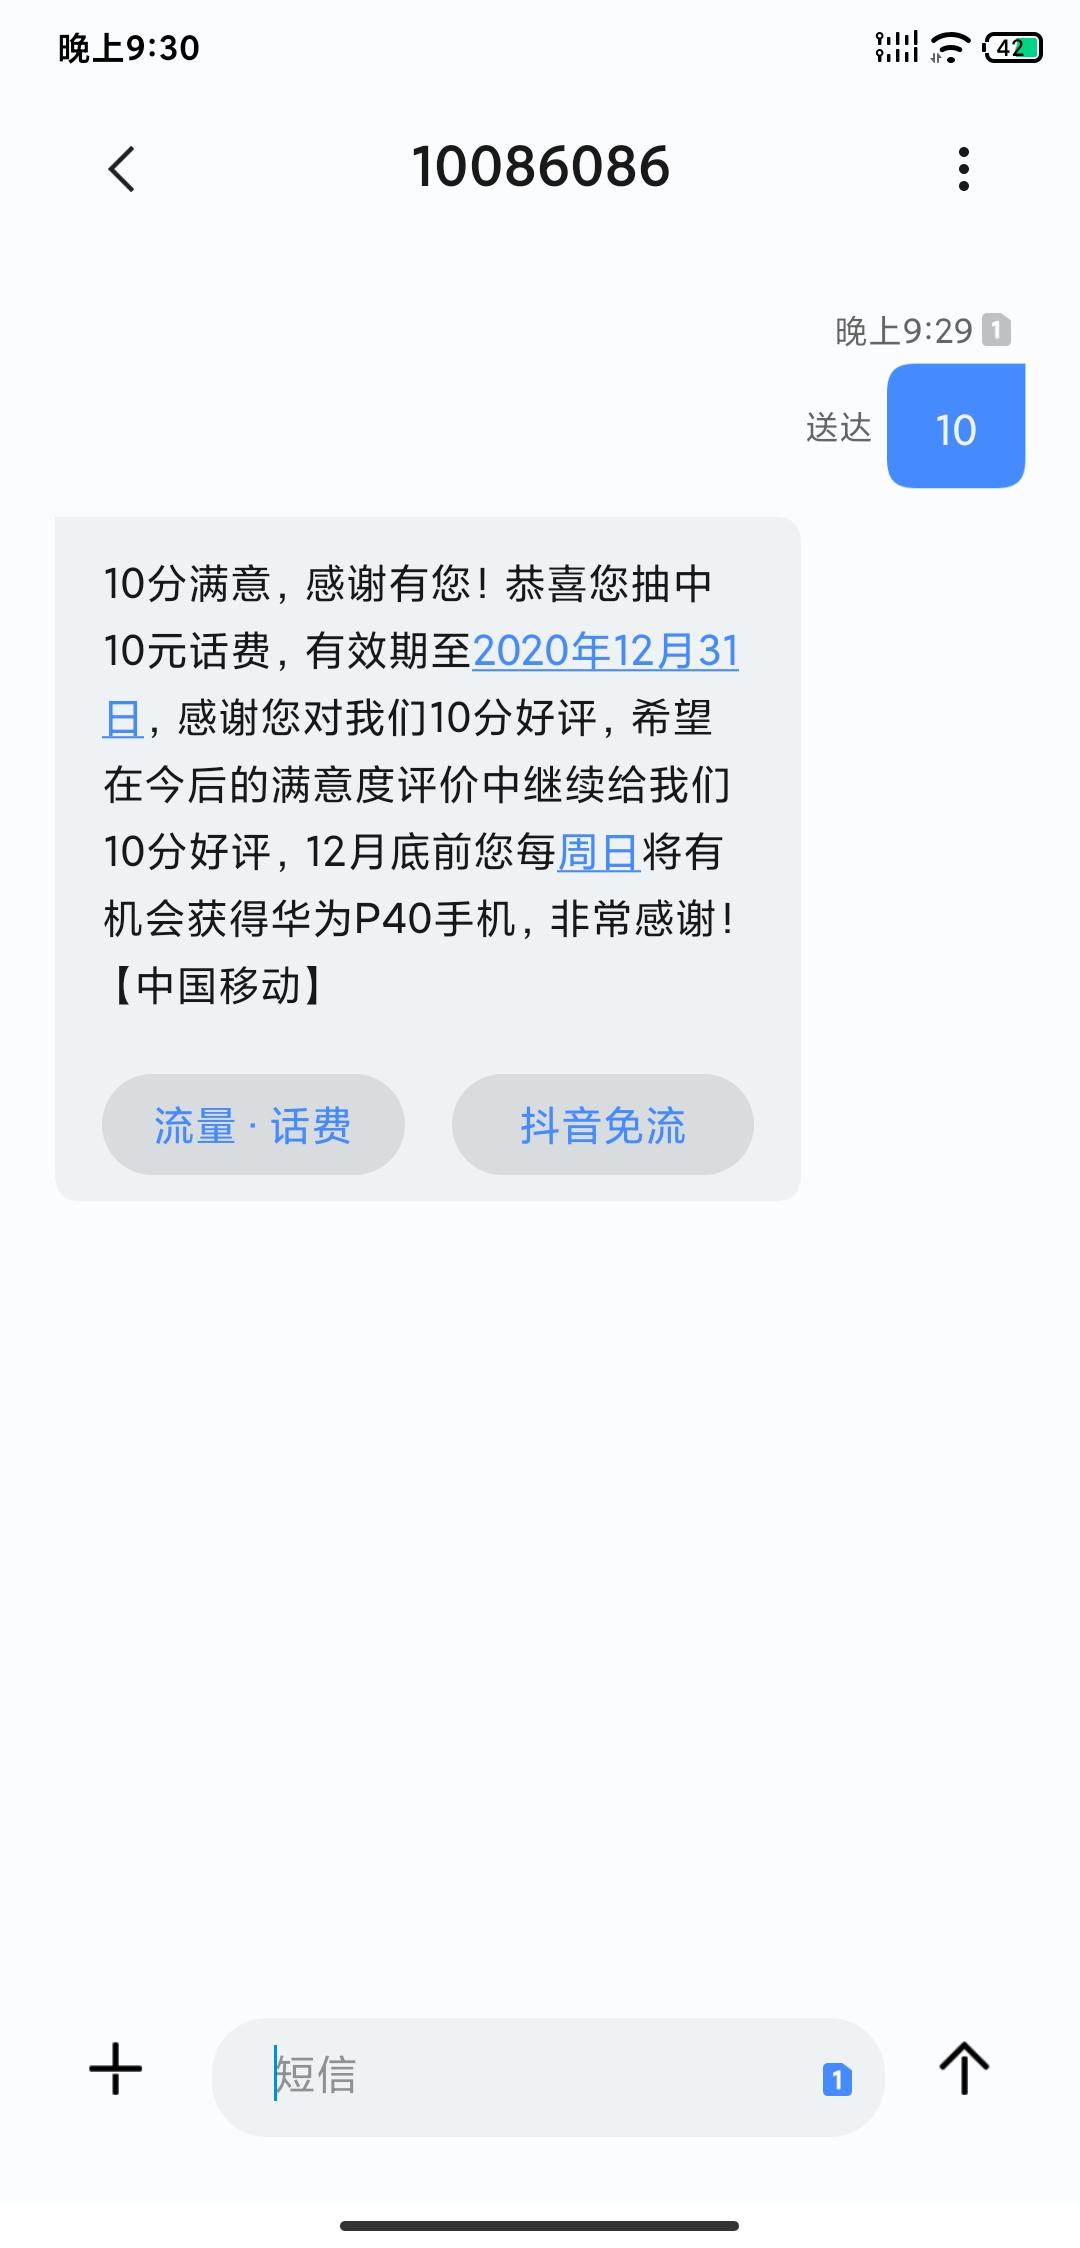 Screenshot_2020-10-25-21-30-24-279_com.android.mm.jpg